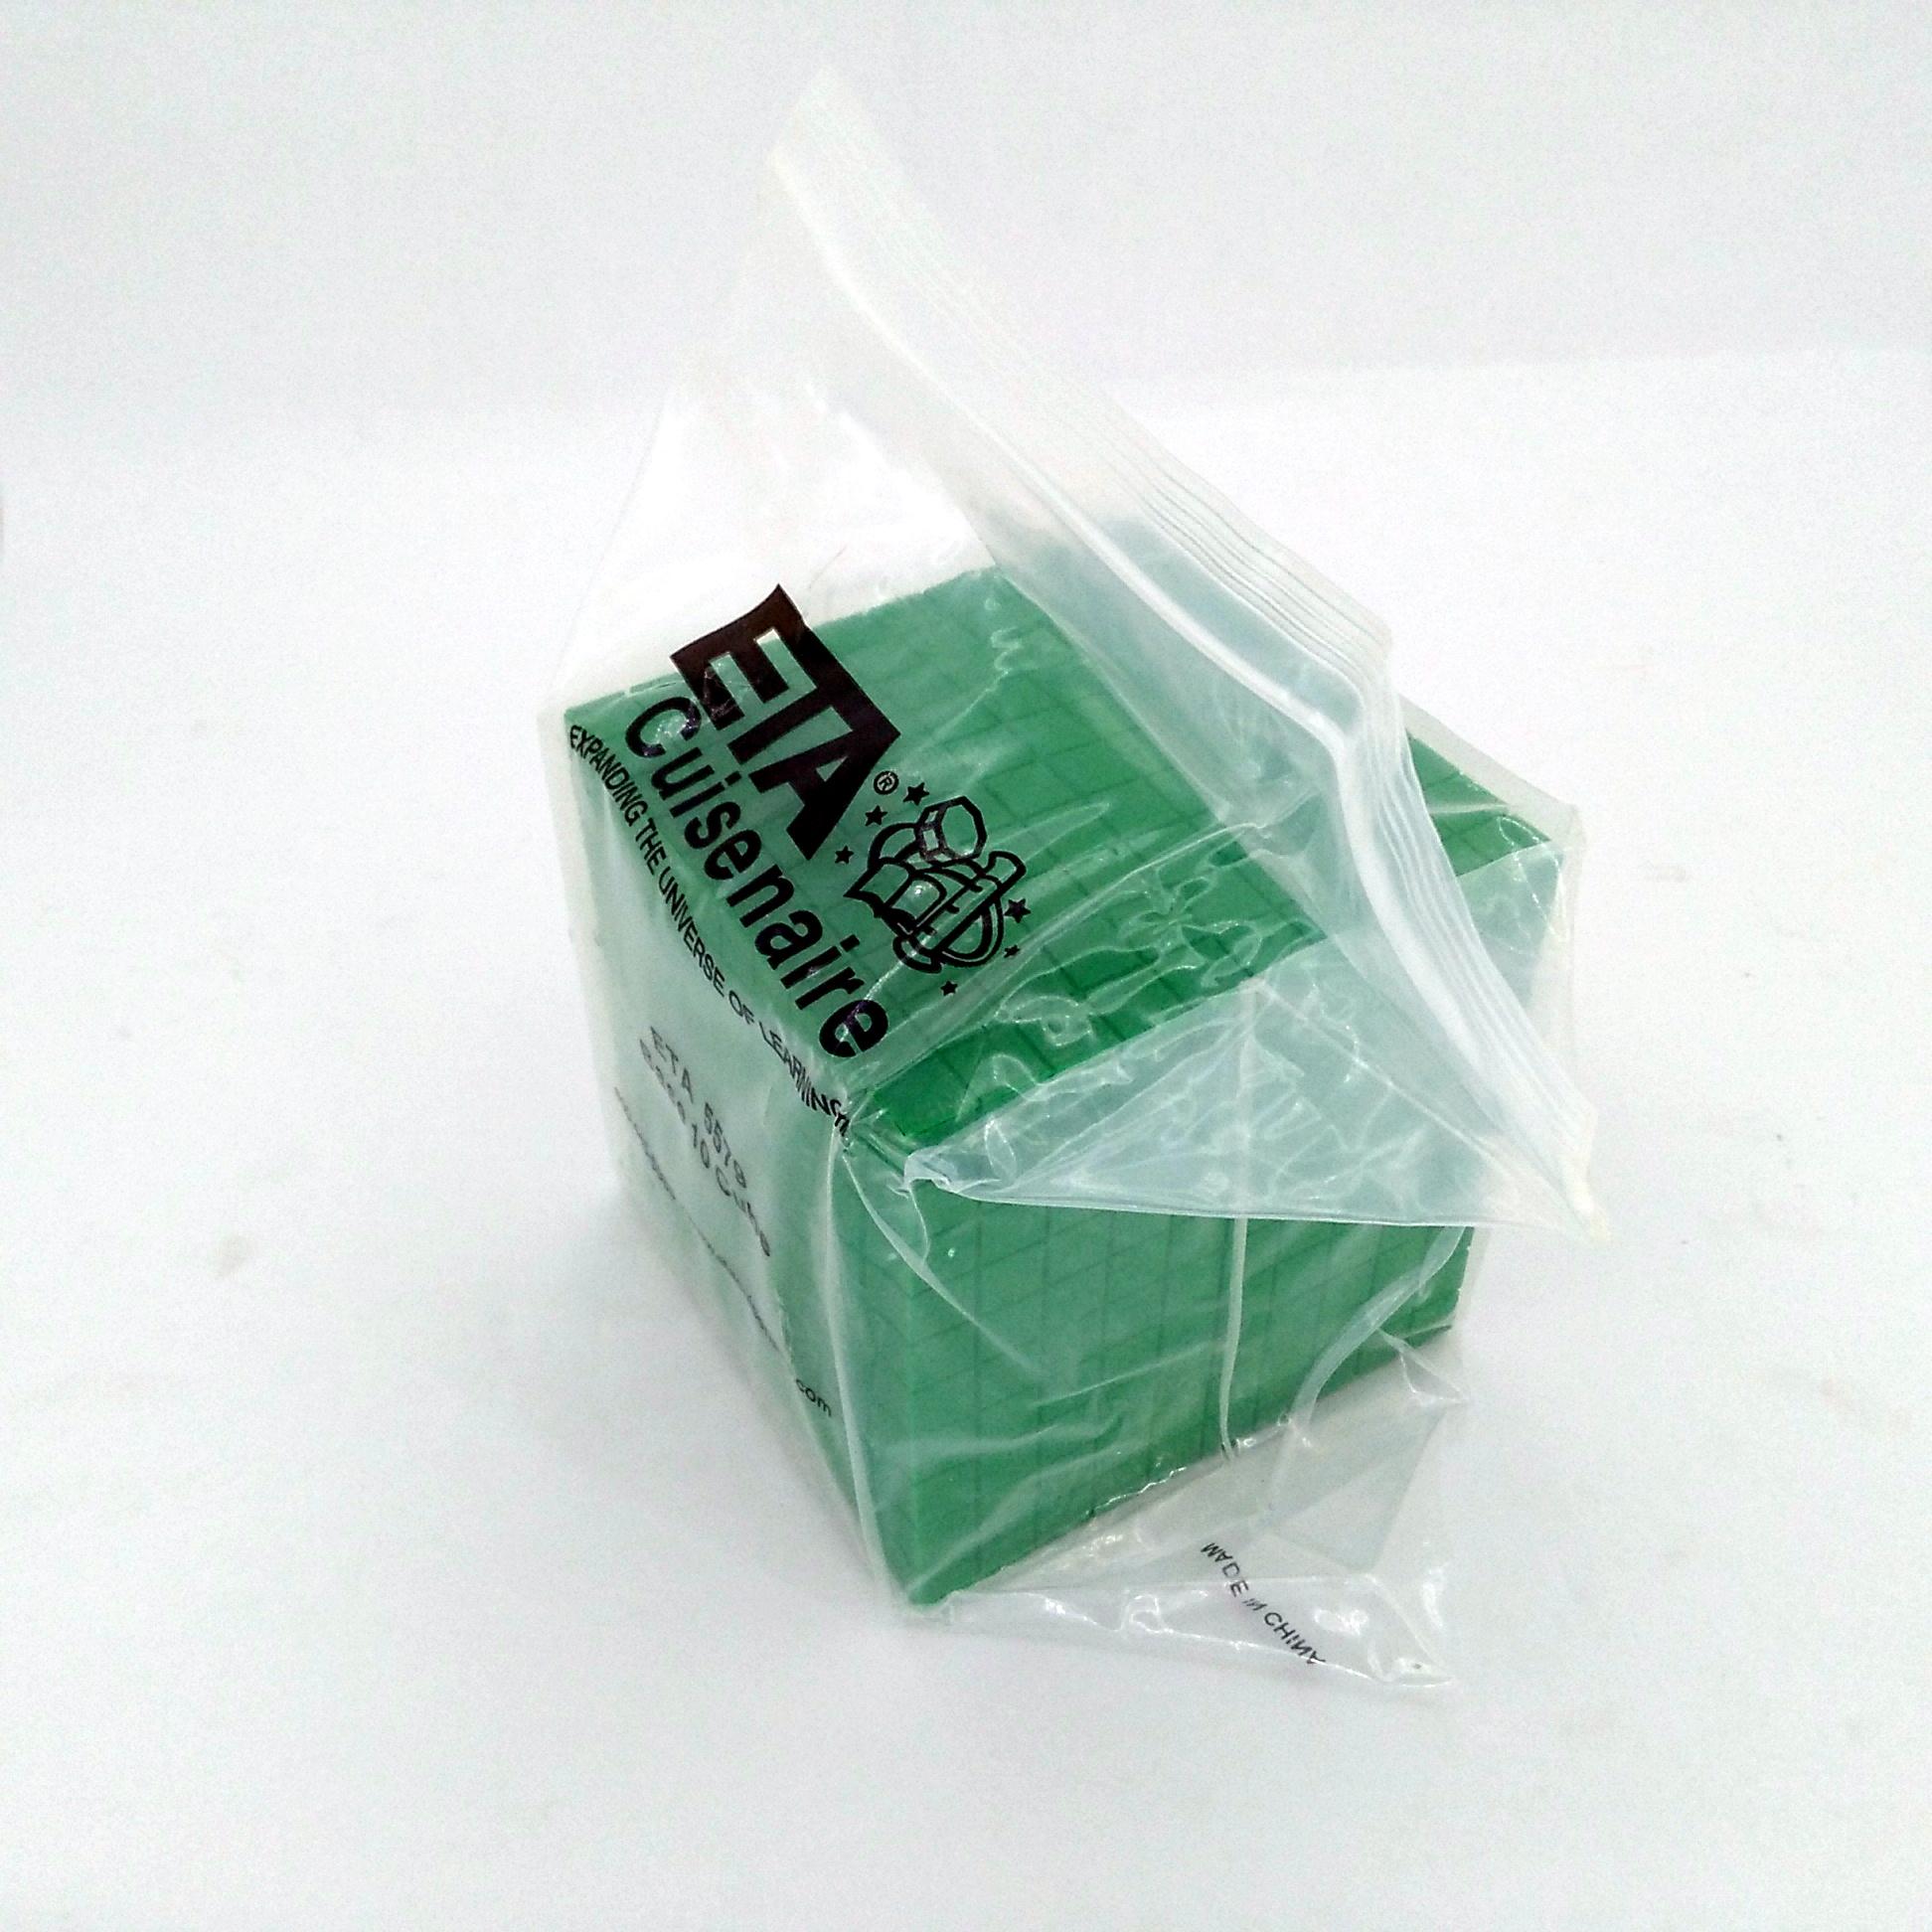 Eta Hand2mind Green Plastic Cube